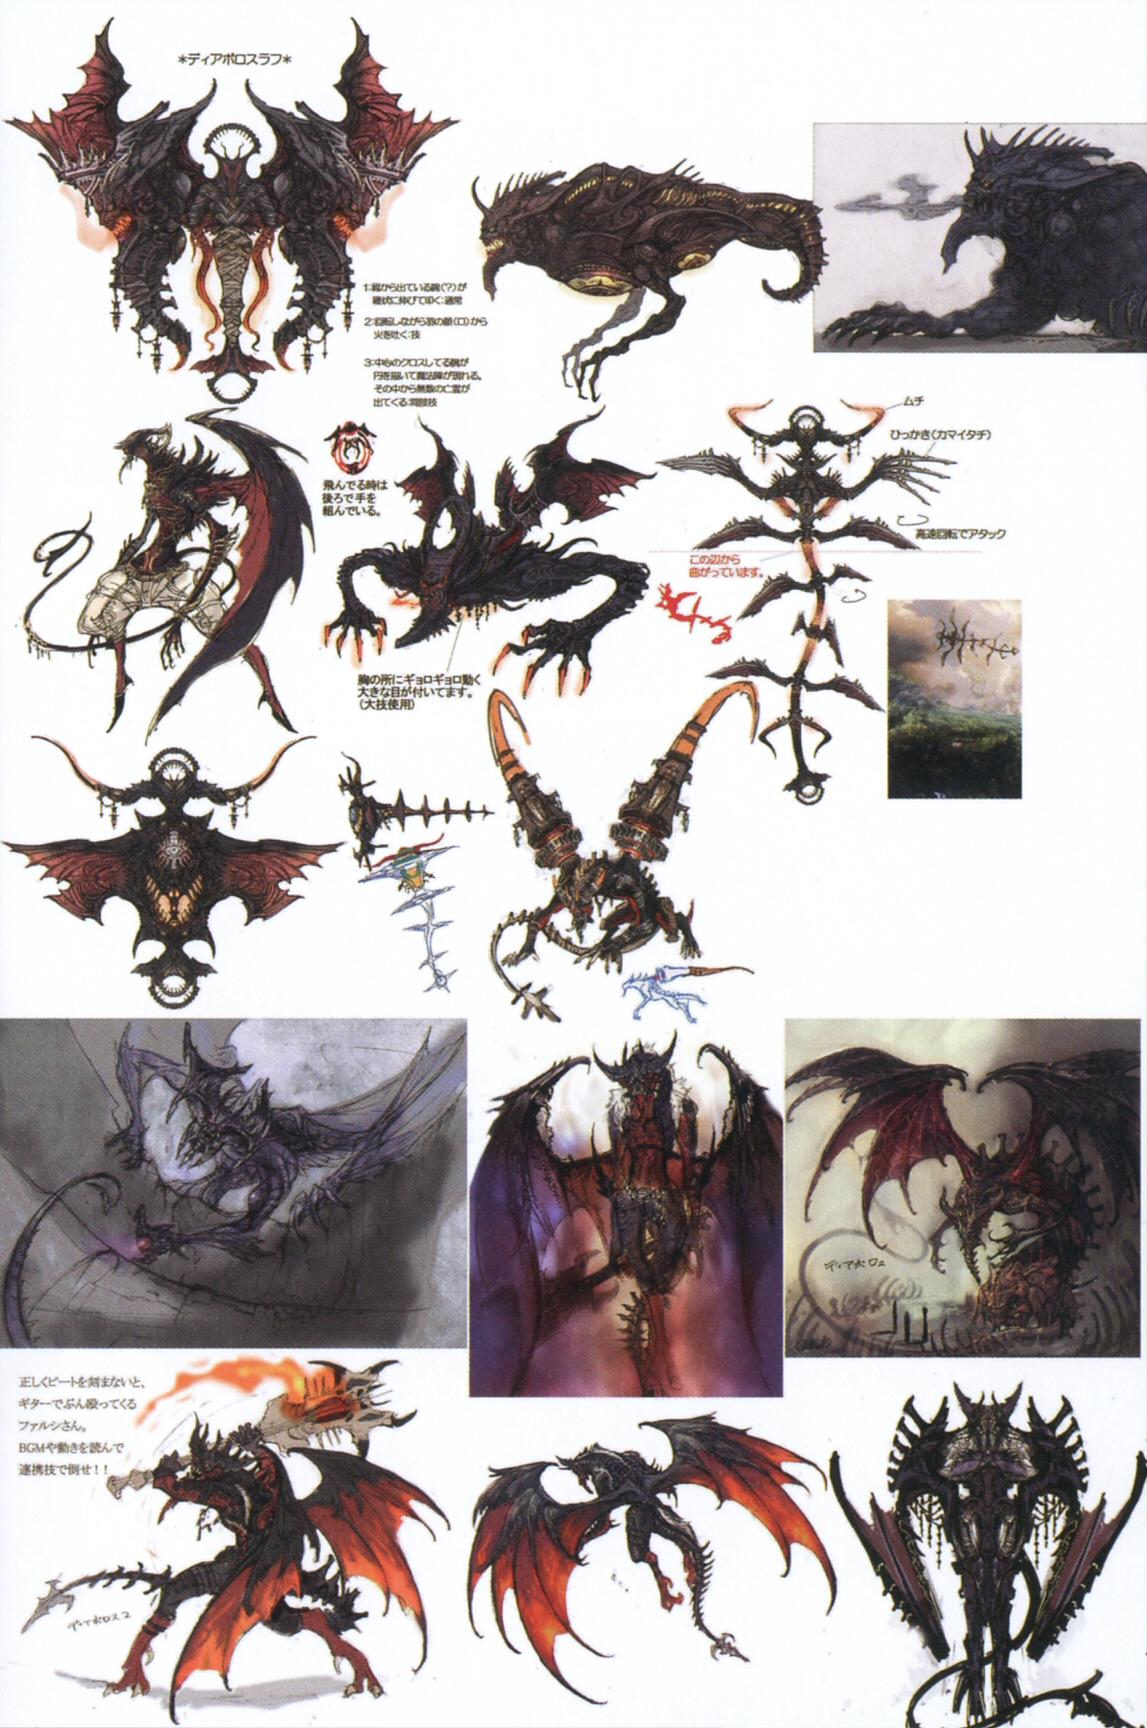 Final fantasy 13 guide pdf